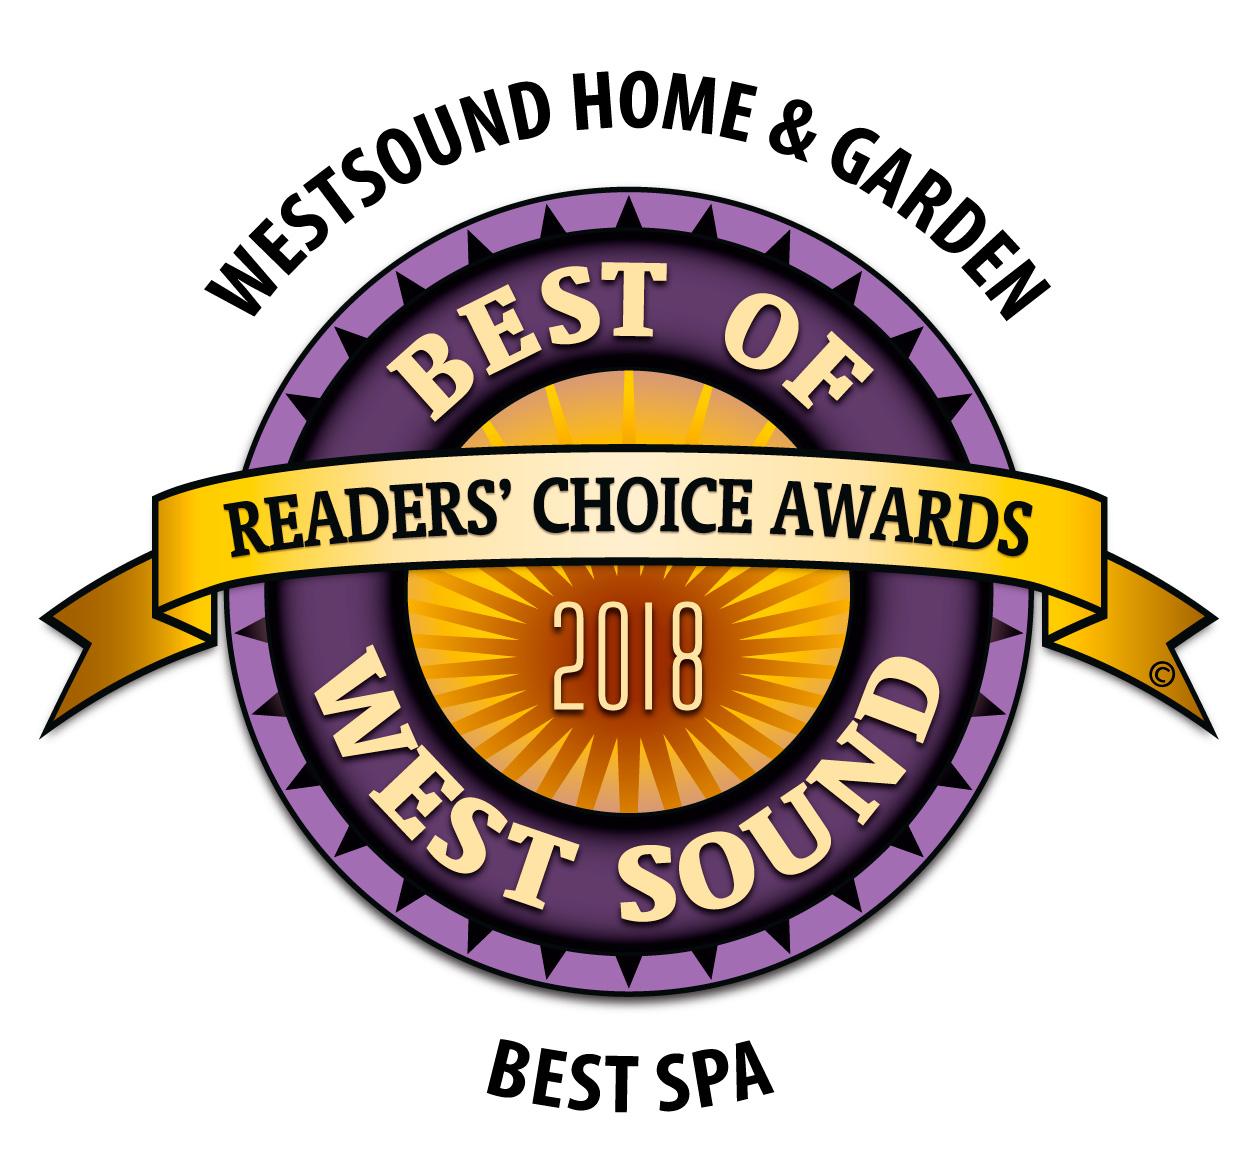 BestOfWestSoundWinnerLogo2018_BestSpa.jpg